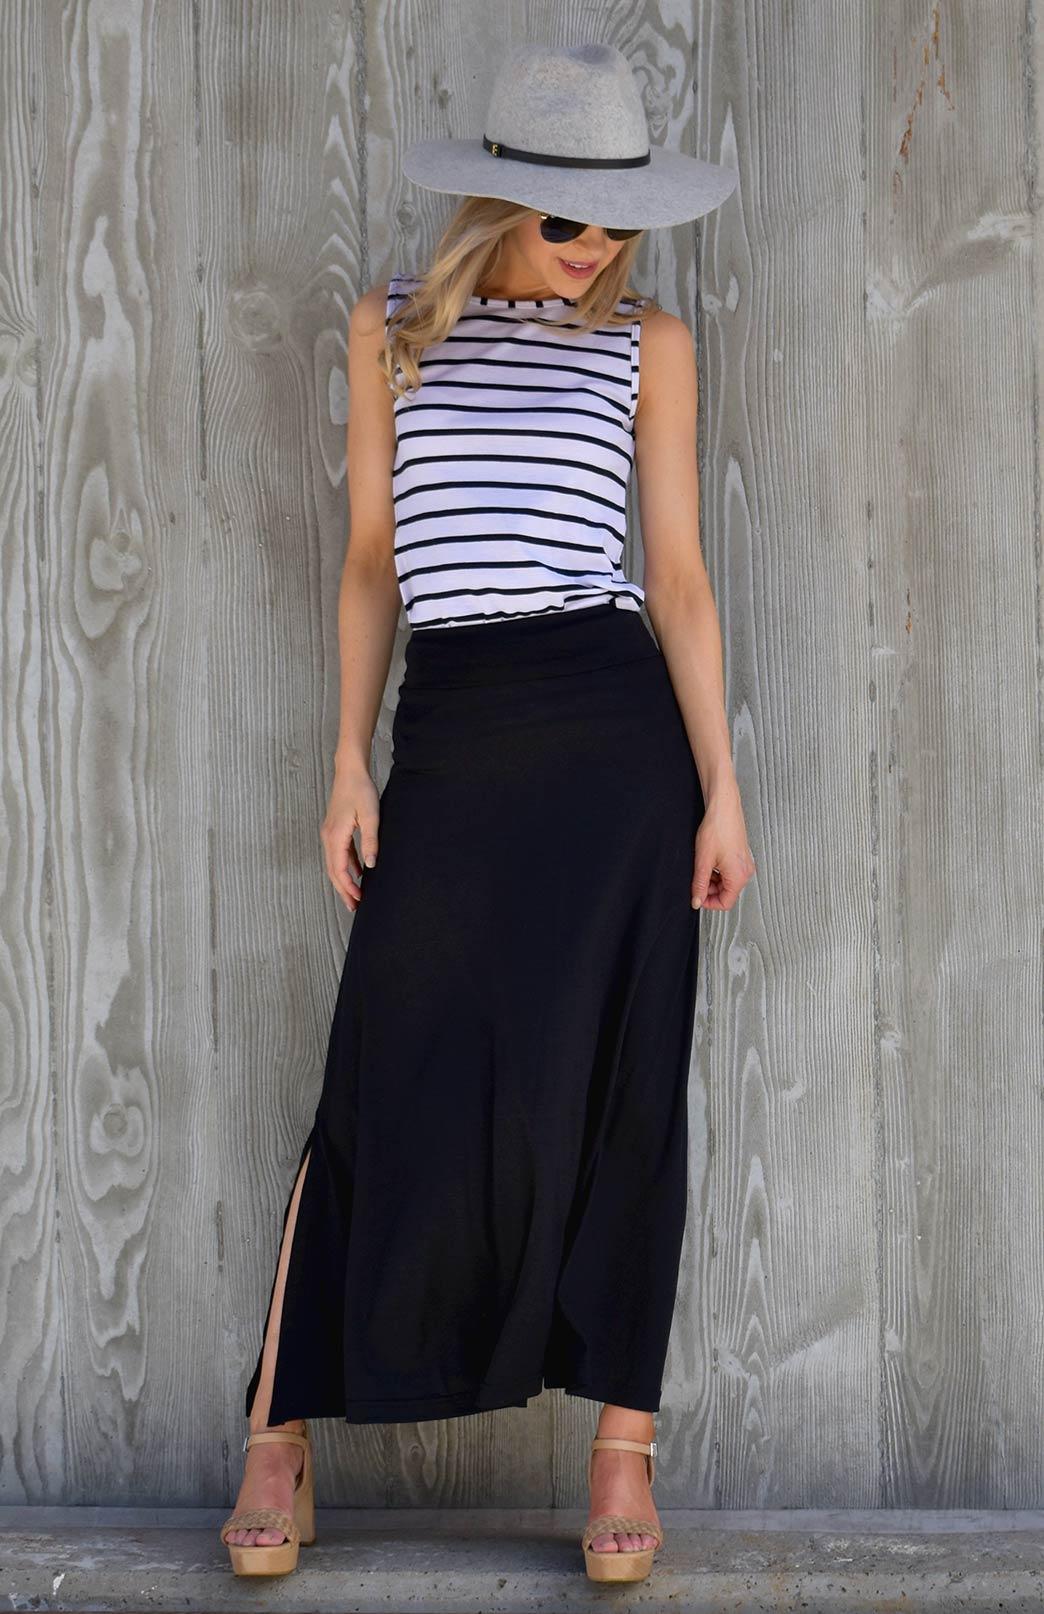 Marion Skirt - Women's Black Merino Wool Maxi Skirt - Smitten Merino Tasmania Australia